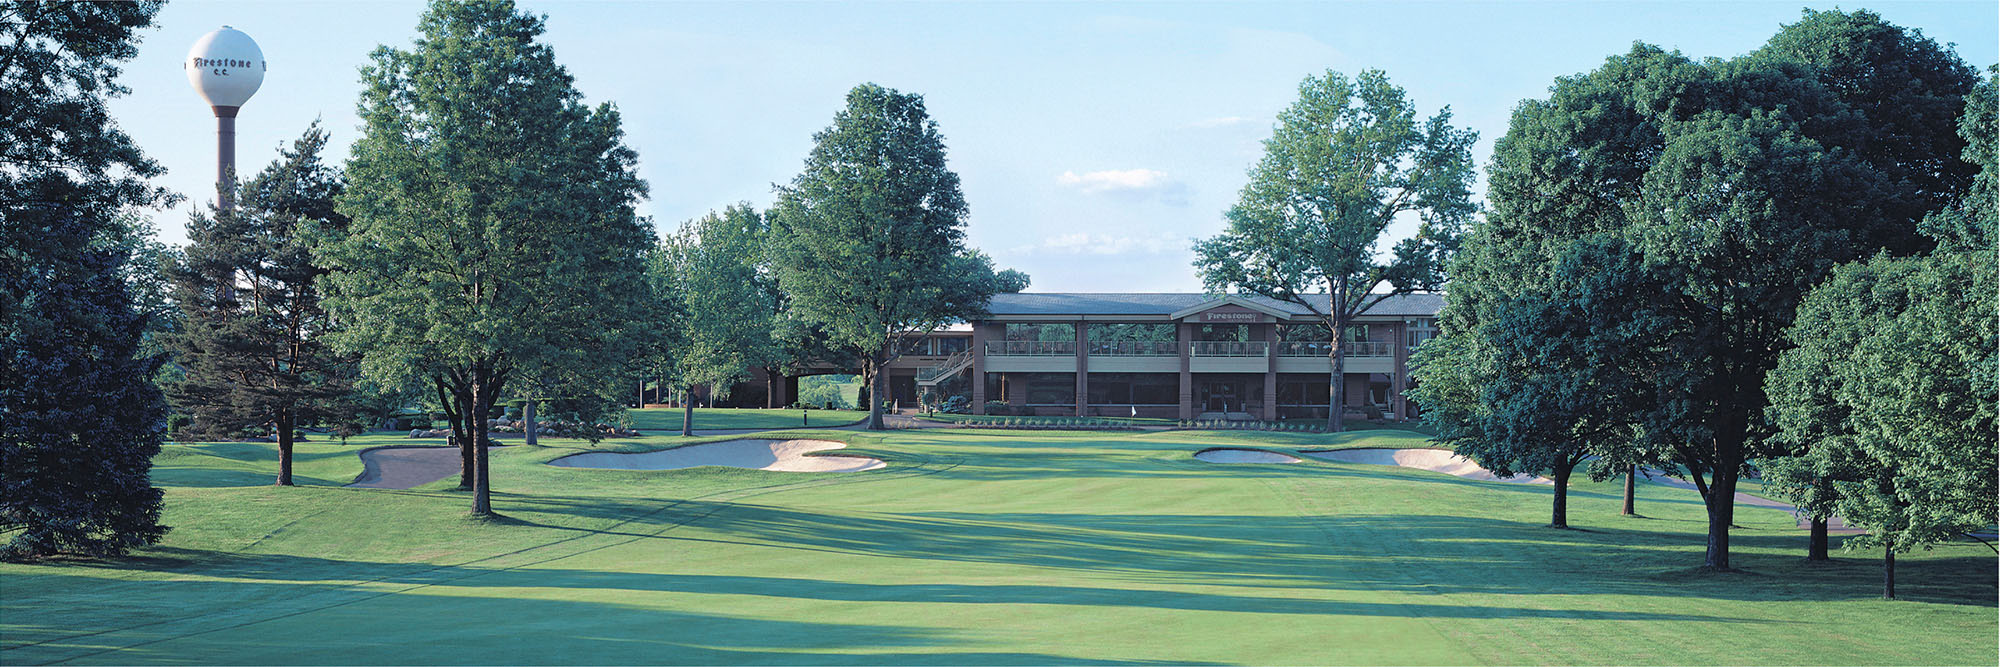 Golf Course Image - Firestone South No. 9